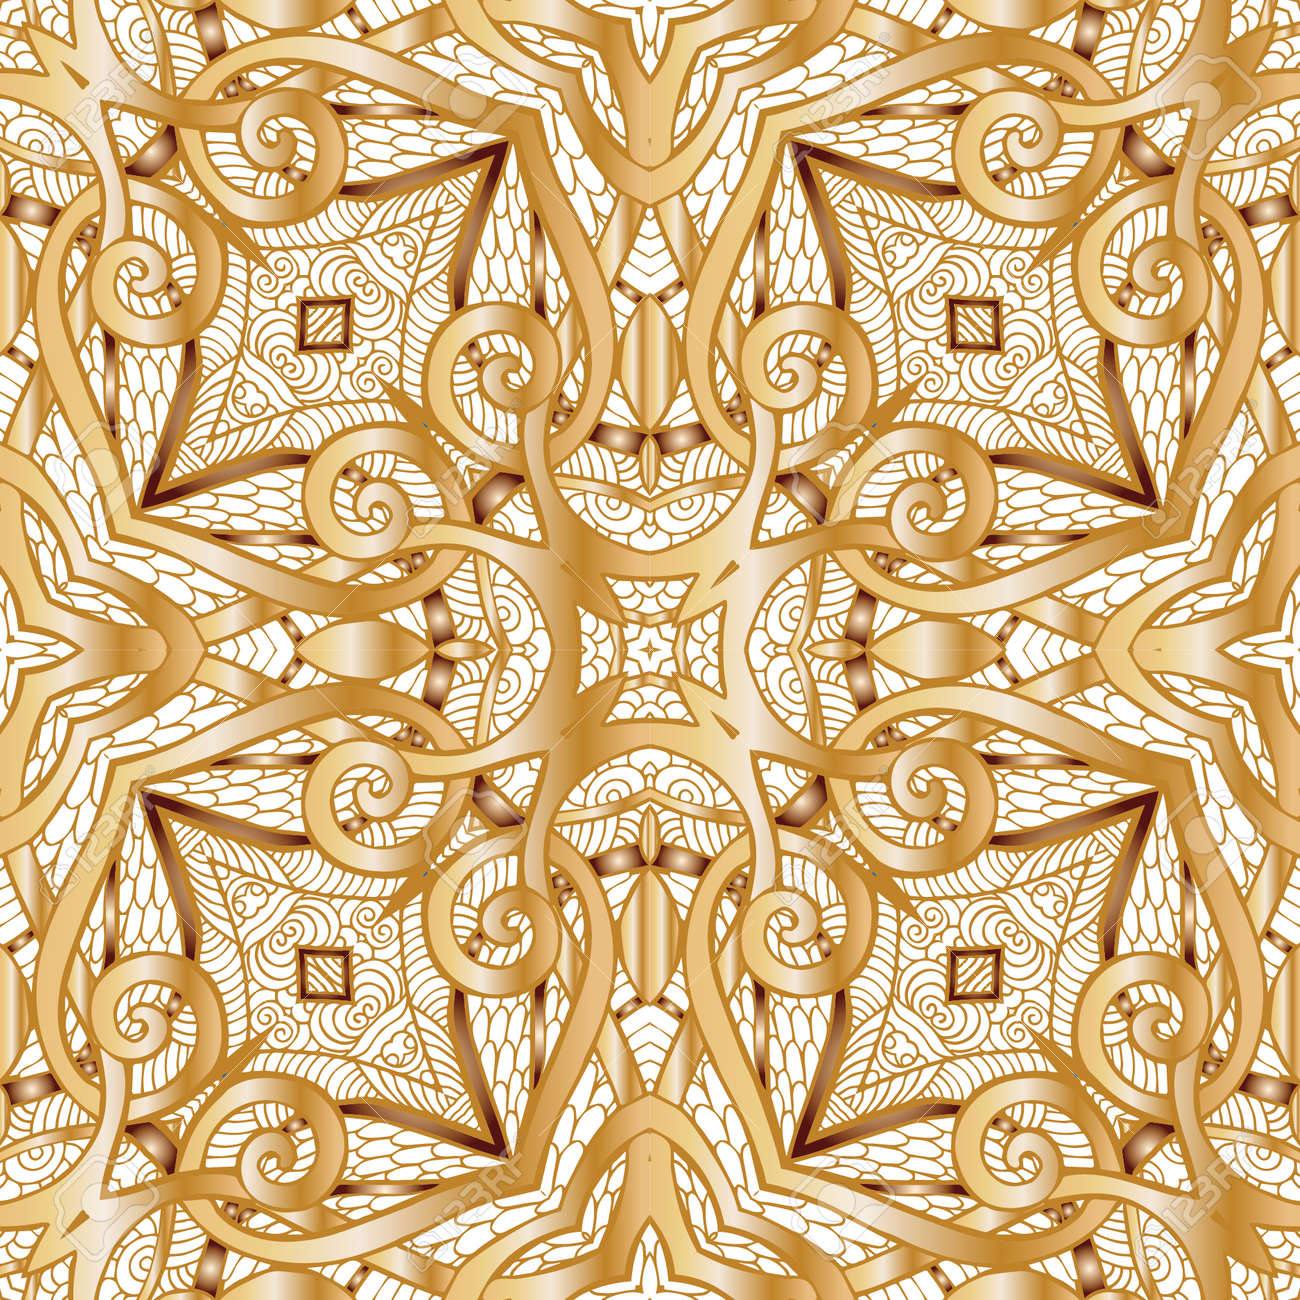 Perfect Art Nouveau Wall Collection - Art & Wall Decor - hecatalog.info